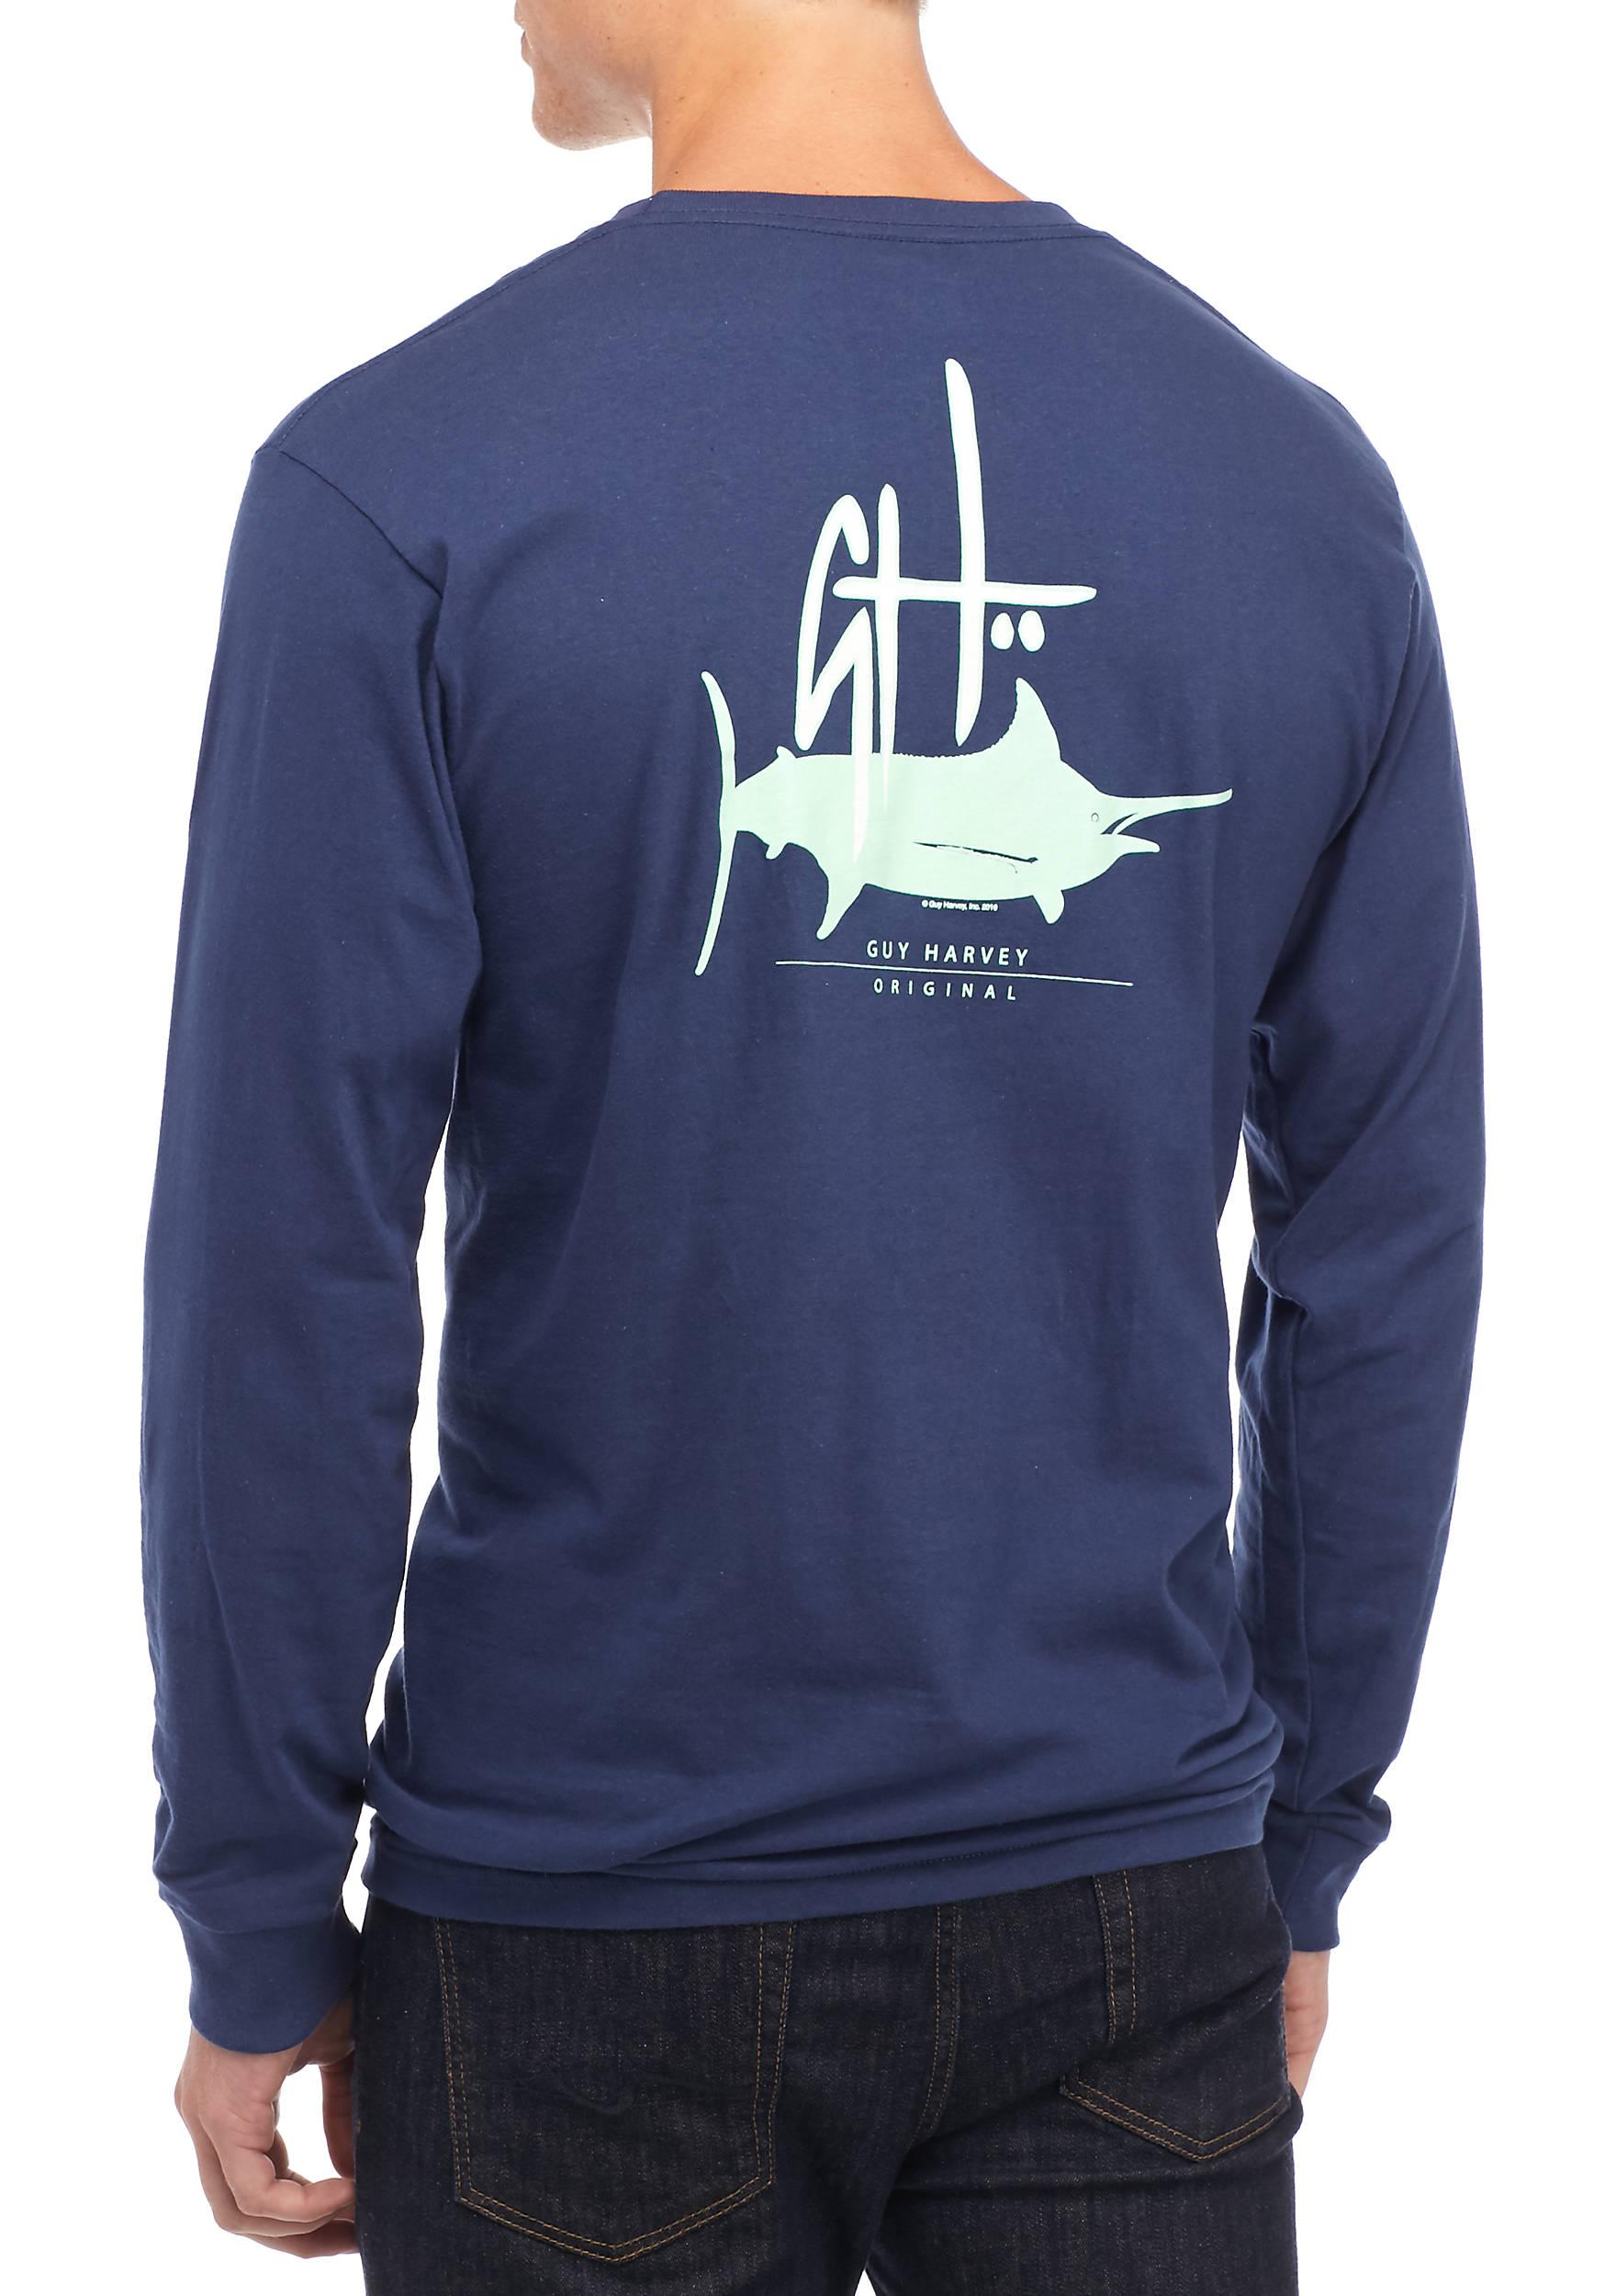 8c06f086ff25 Guy Harvey Long Sleeve T Shirts | Toffee Art